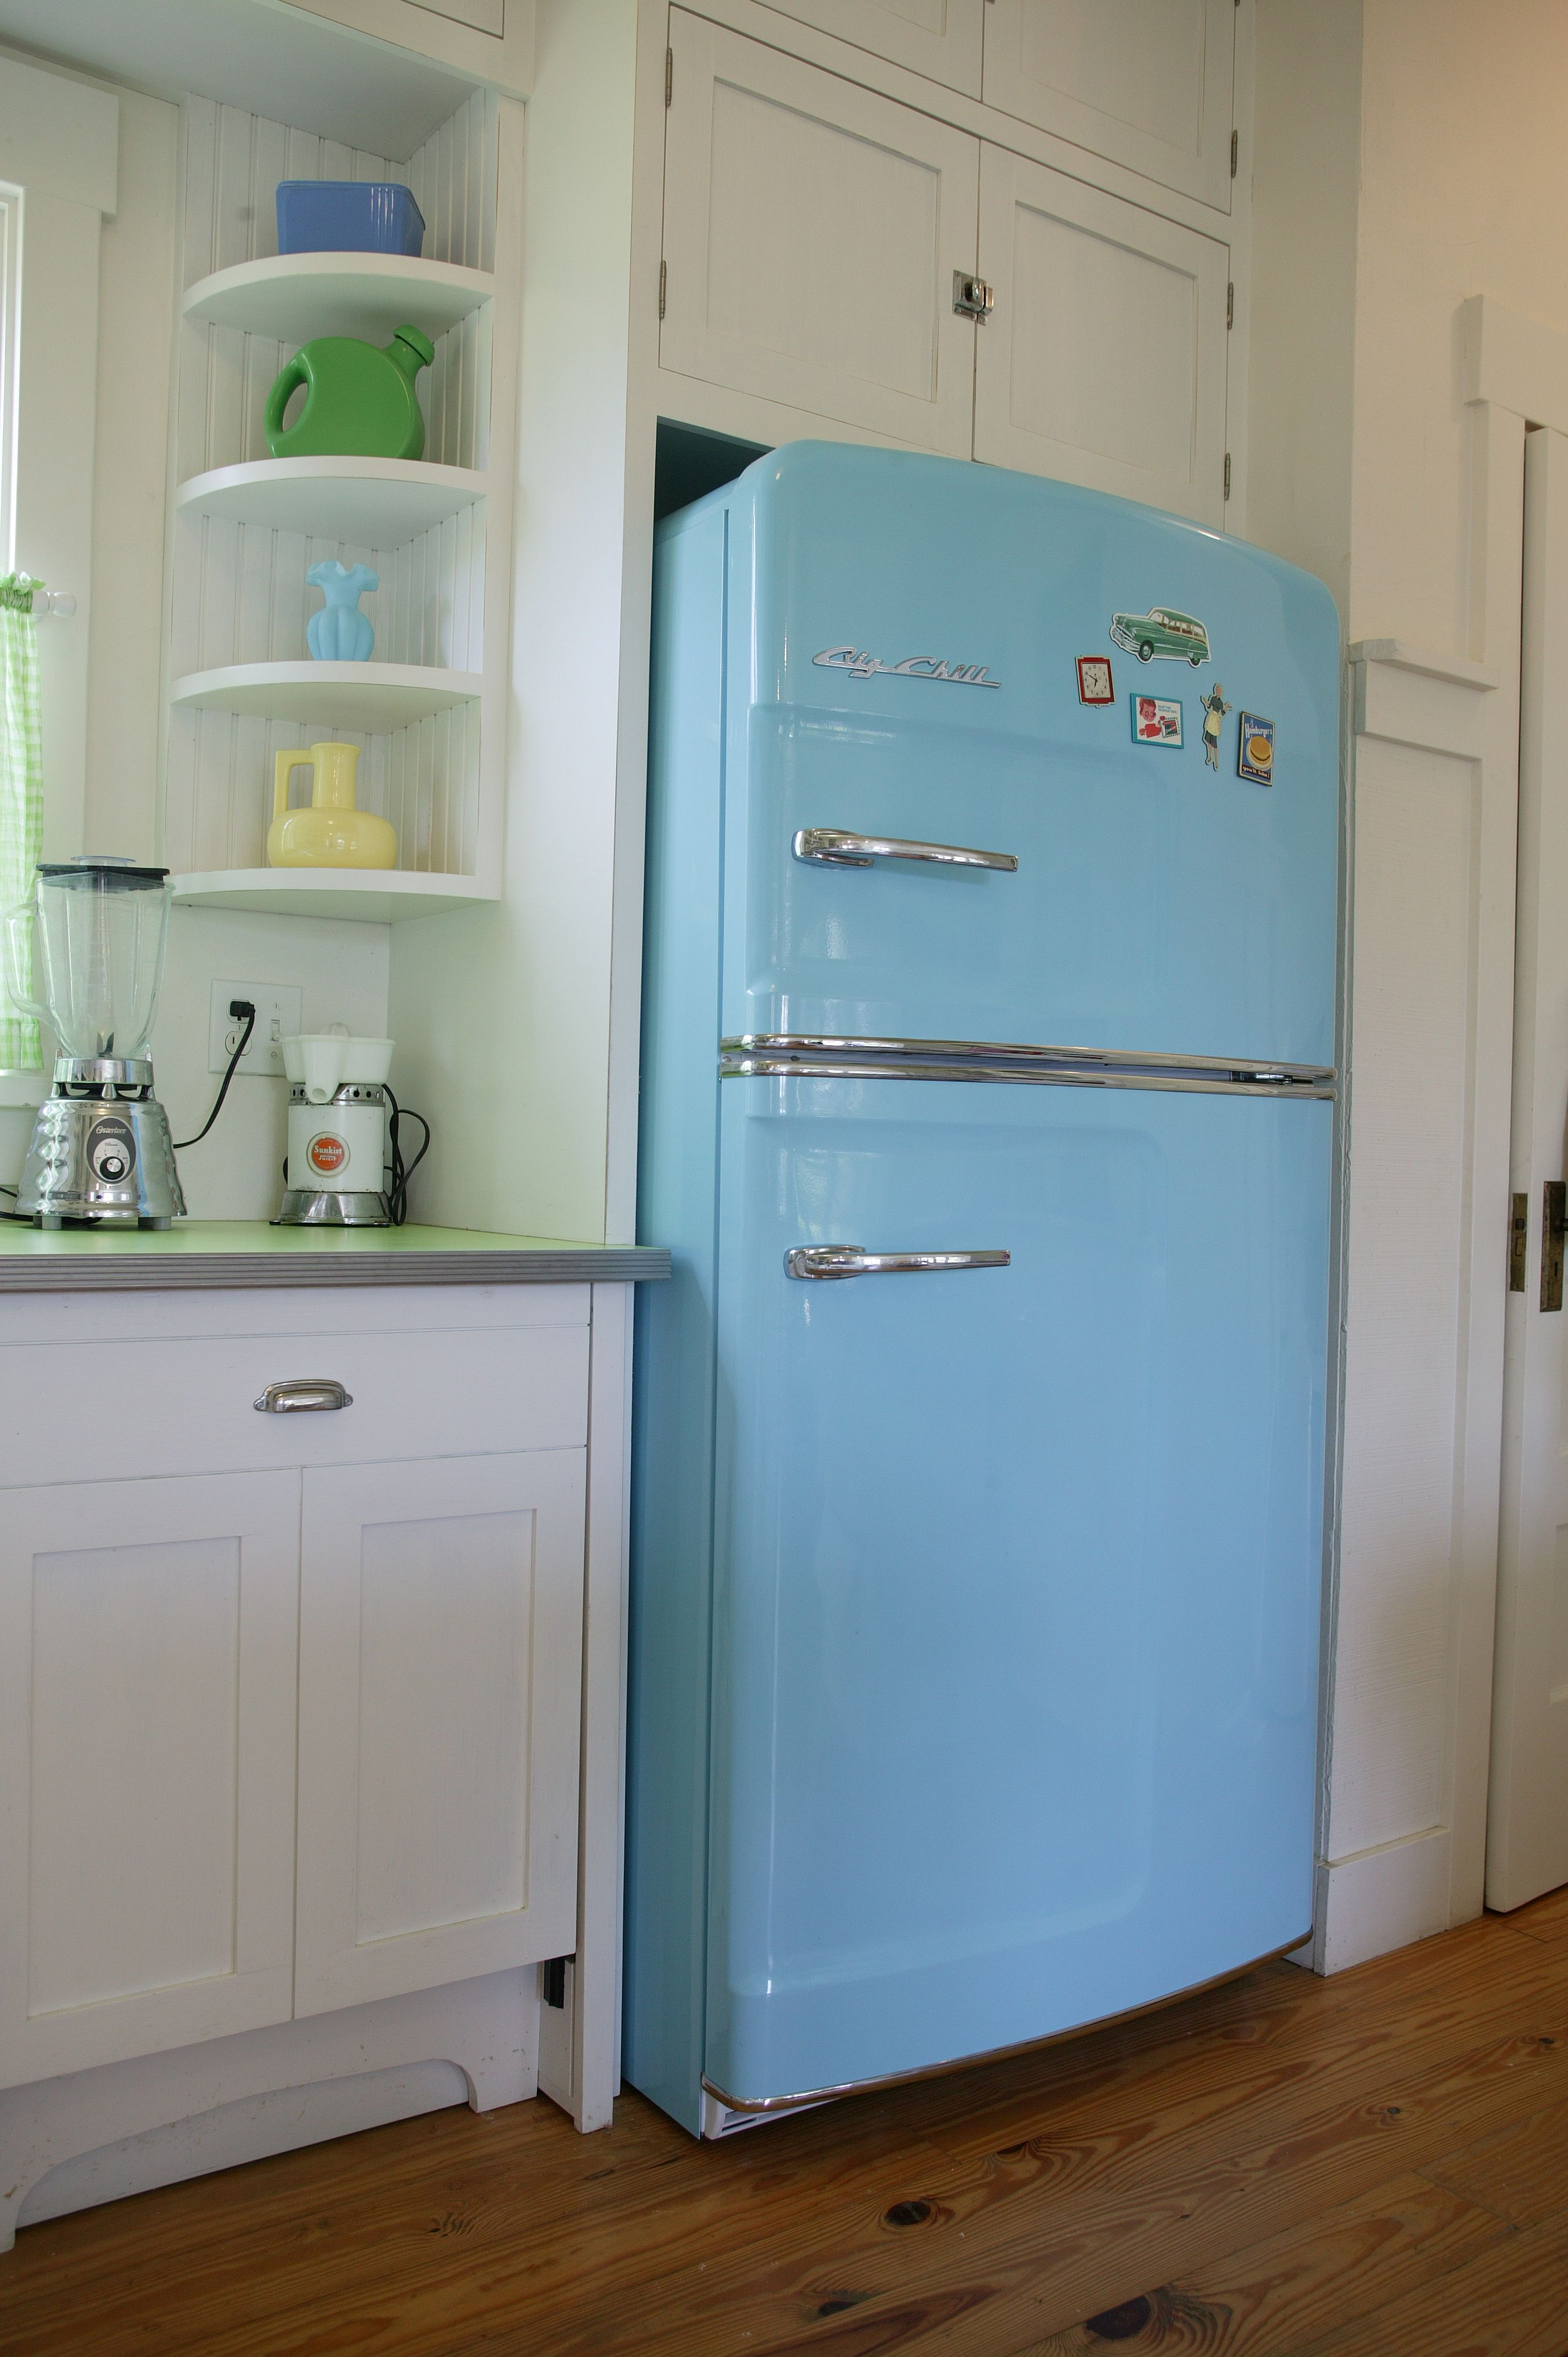 Retro Kitchen Appliances Gallery Big Chill Retro Kitchen Appliances Vintage Fridge Retro Refrigerator Retro style kitchen appliances